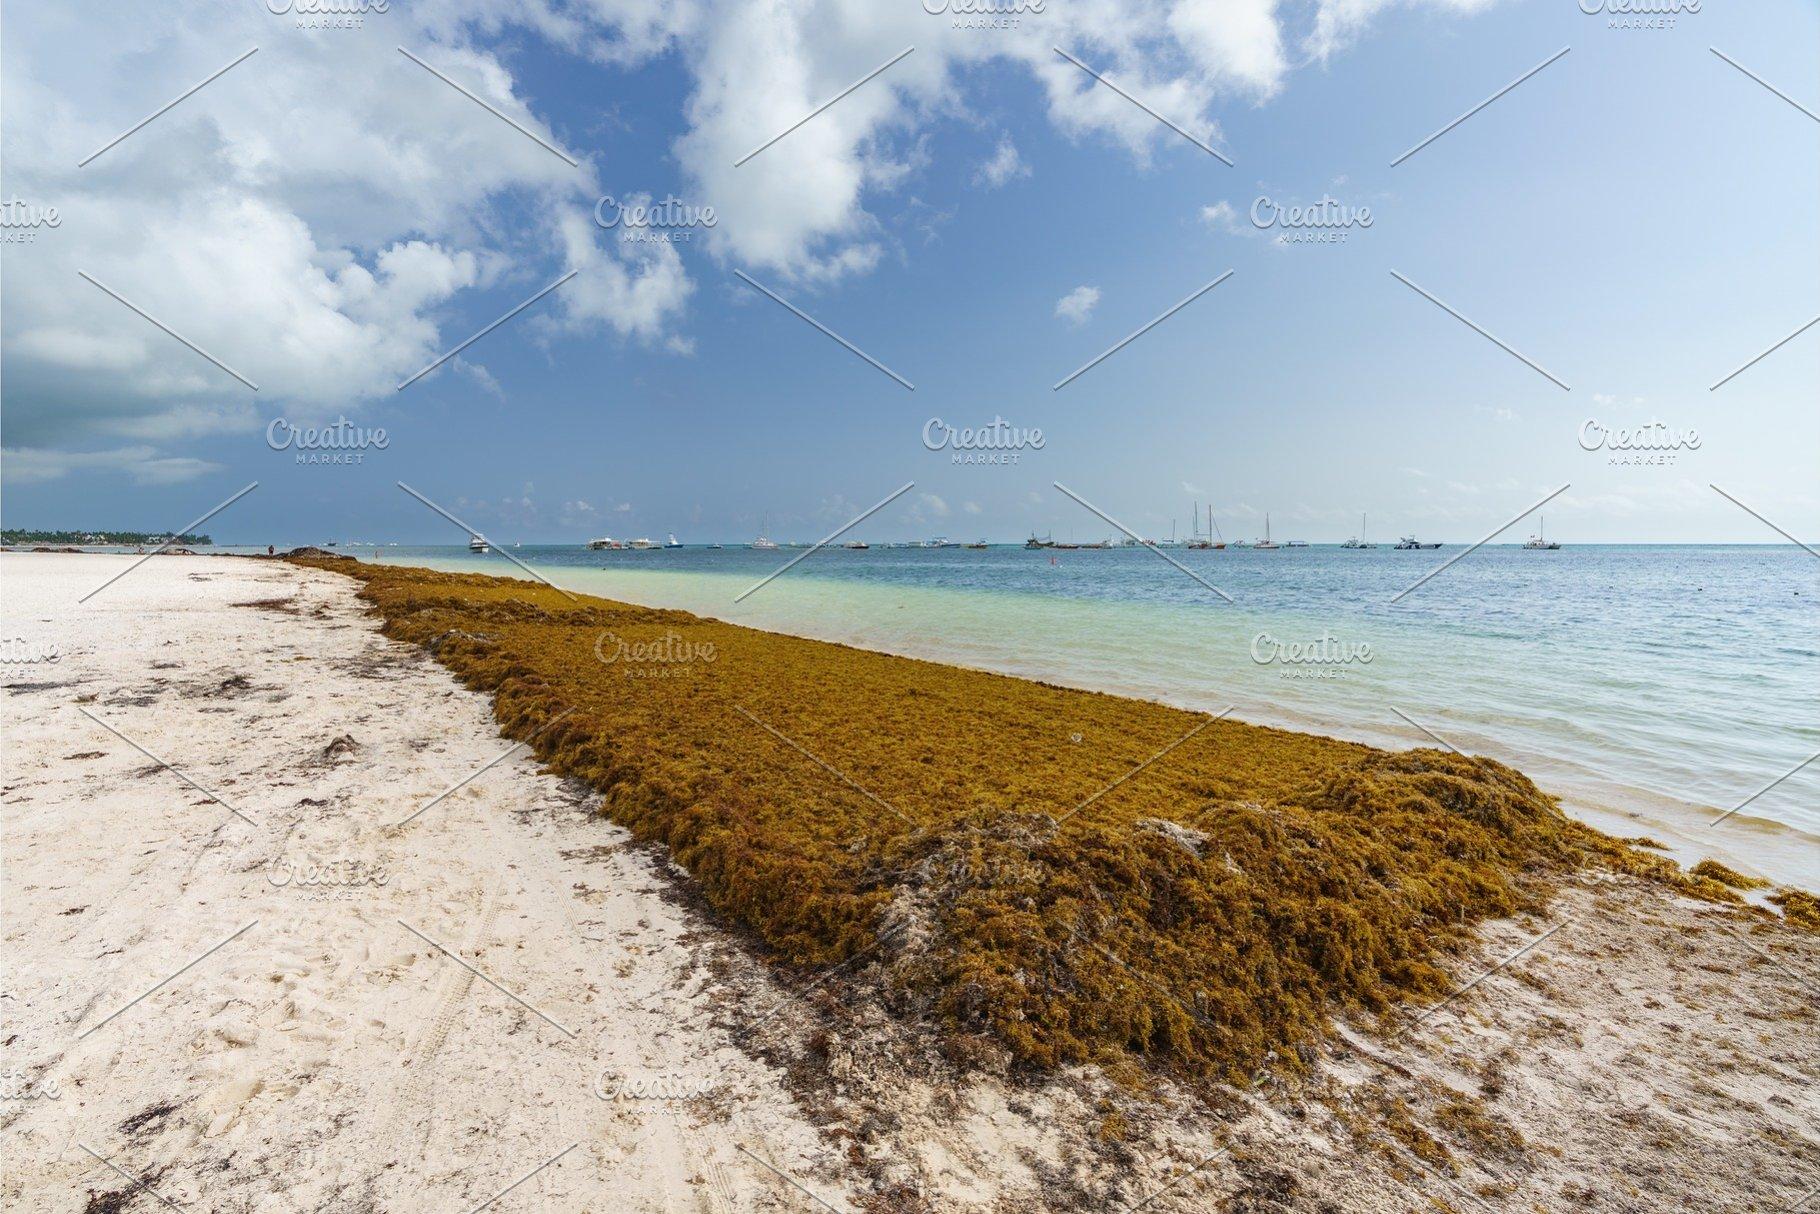 Punta Cana, Dominican Republic -